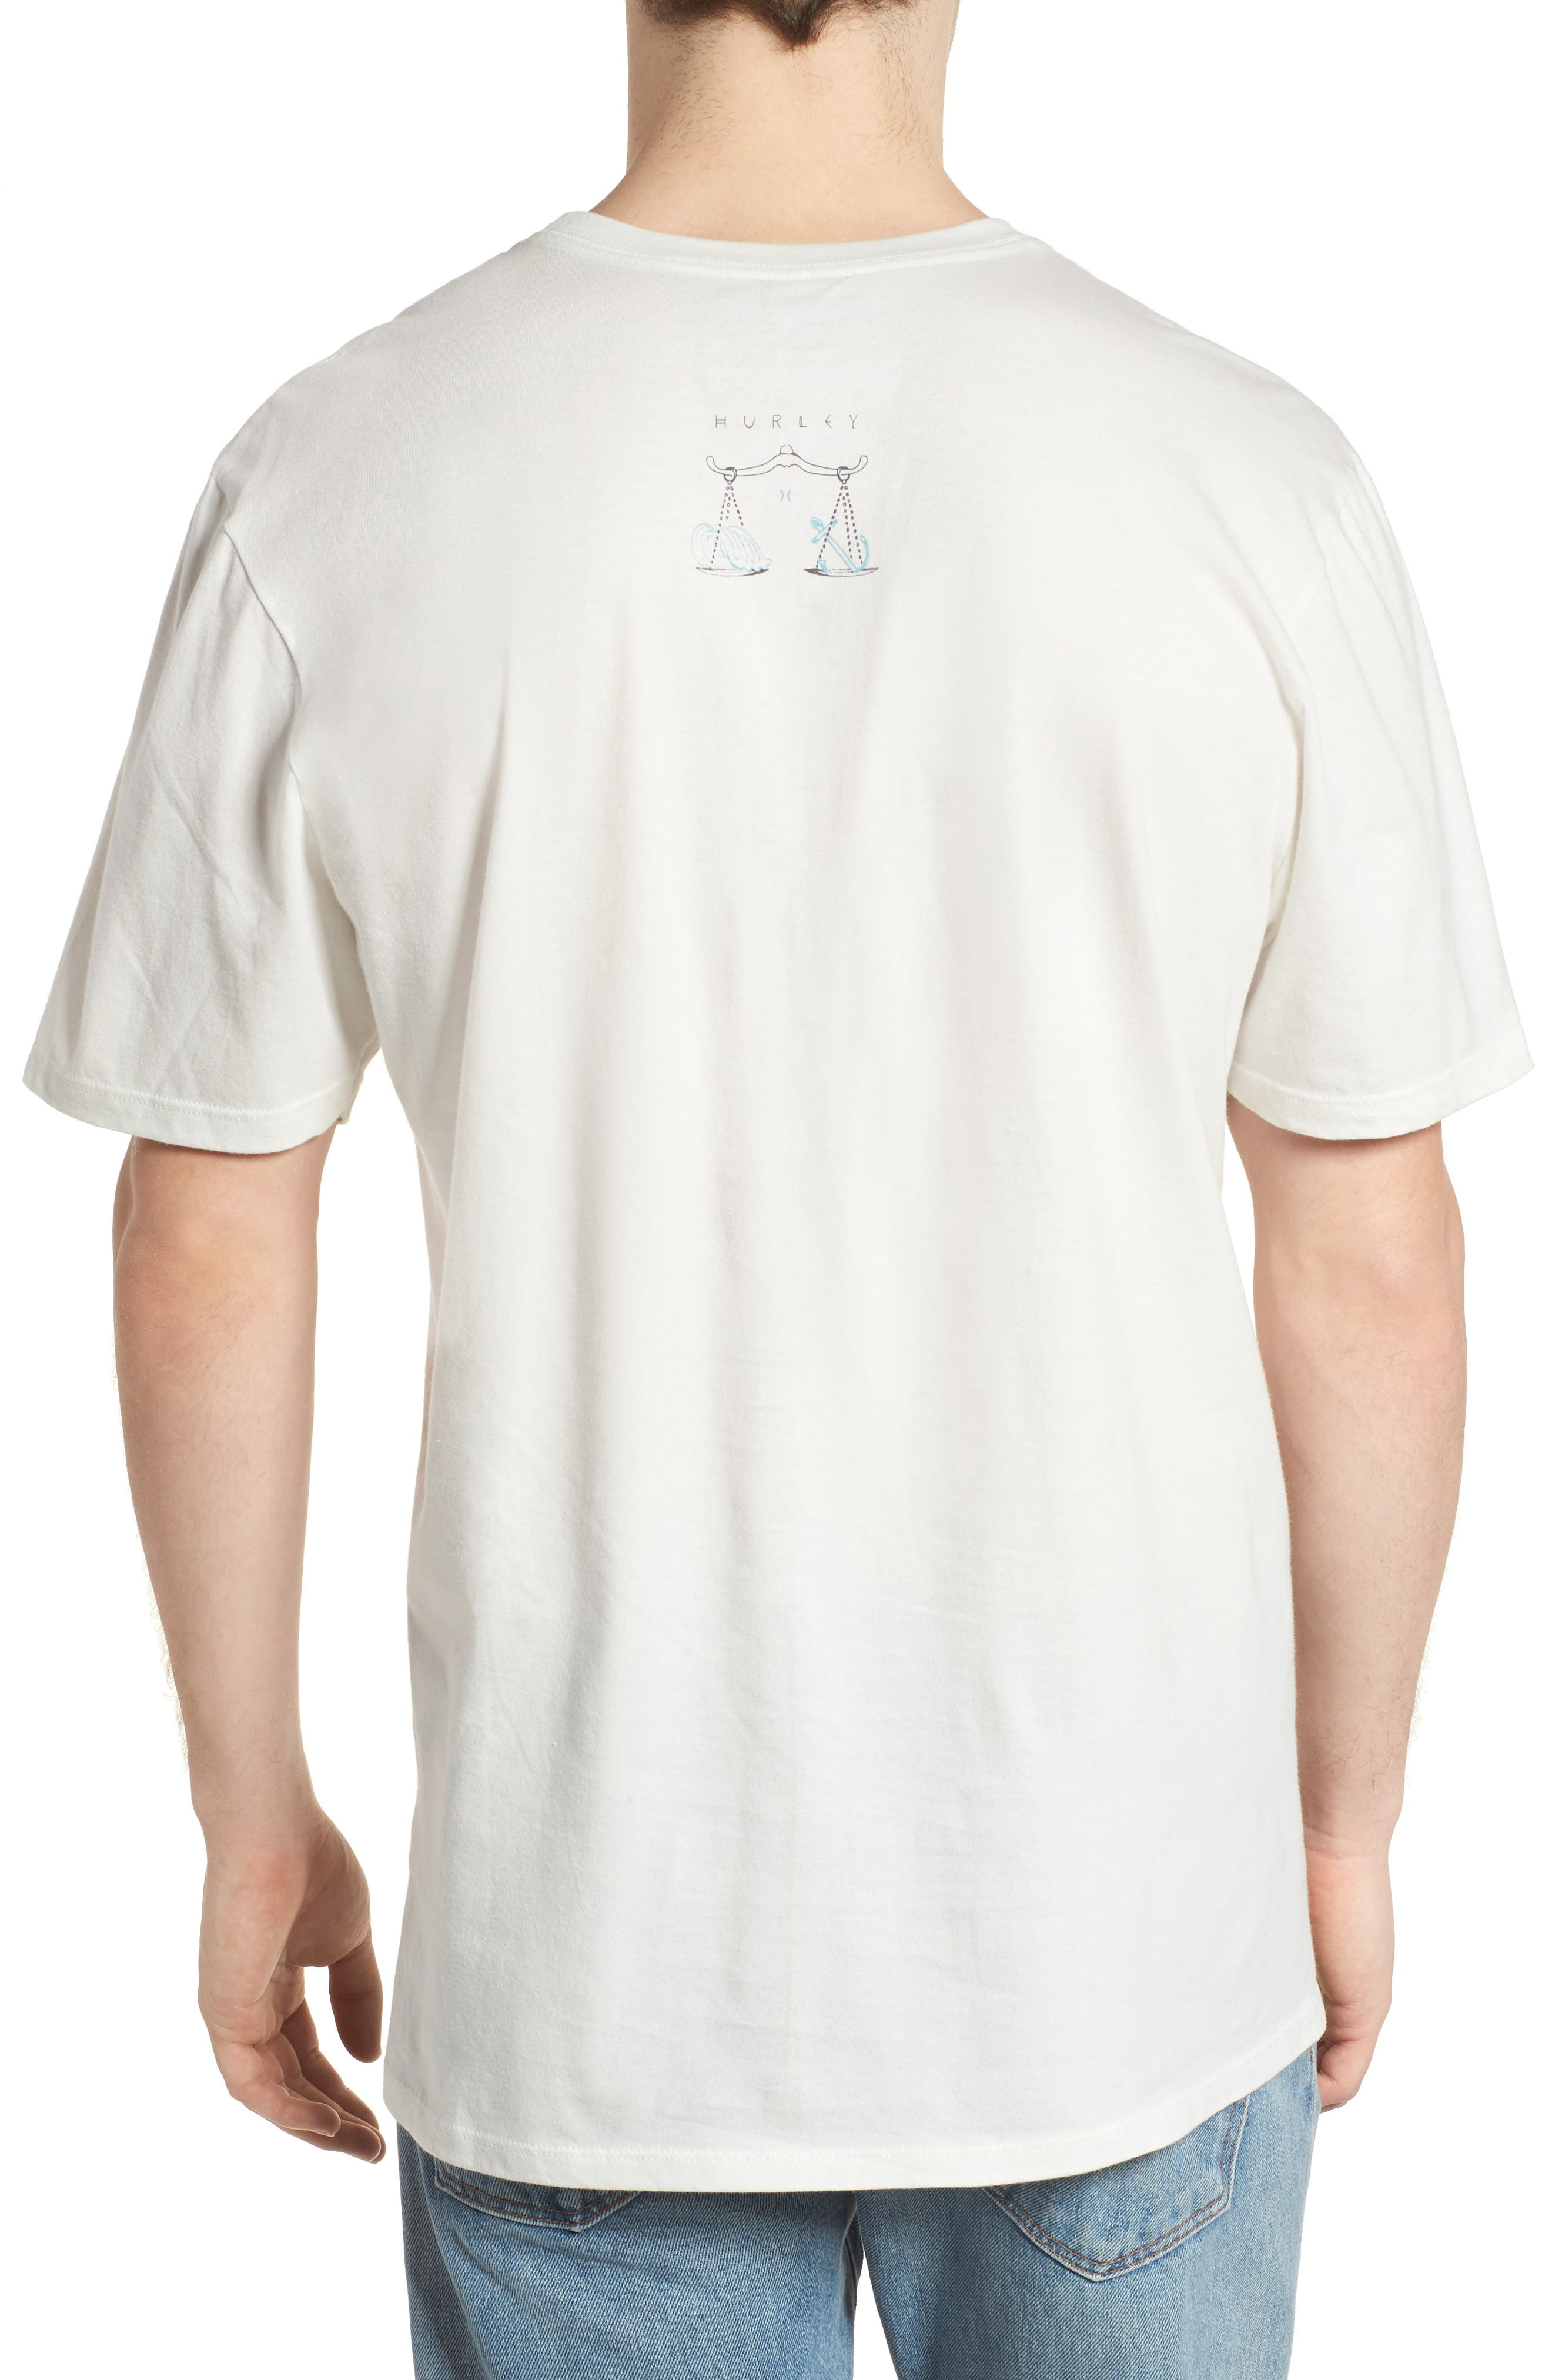 Siren T-Shirt,                             Alternate thumbnail 2, color,